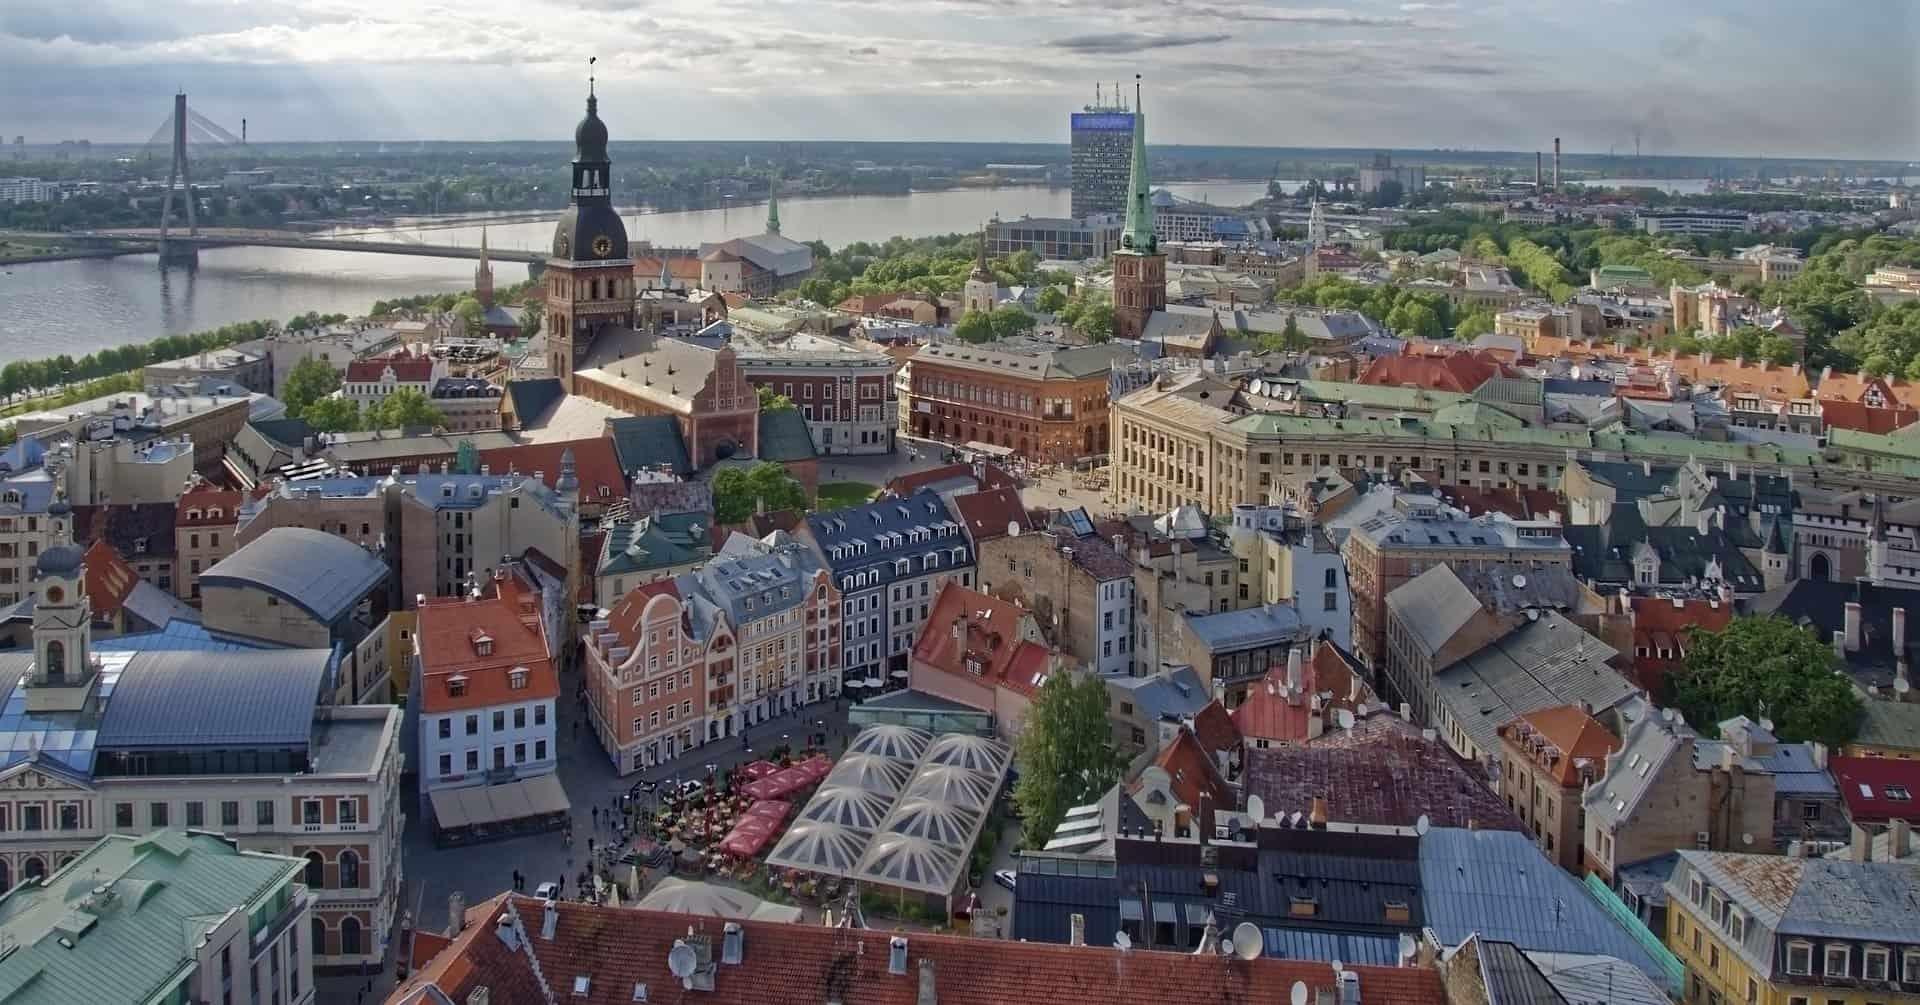 Flüge nach Riga - nur 5,00€ Flug nach Lettland